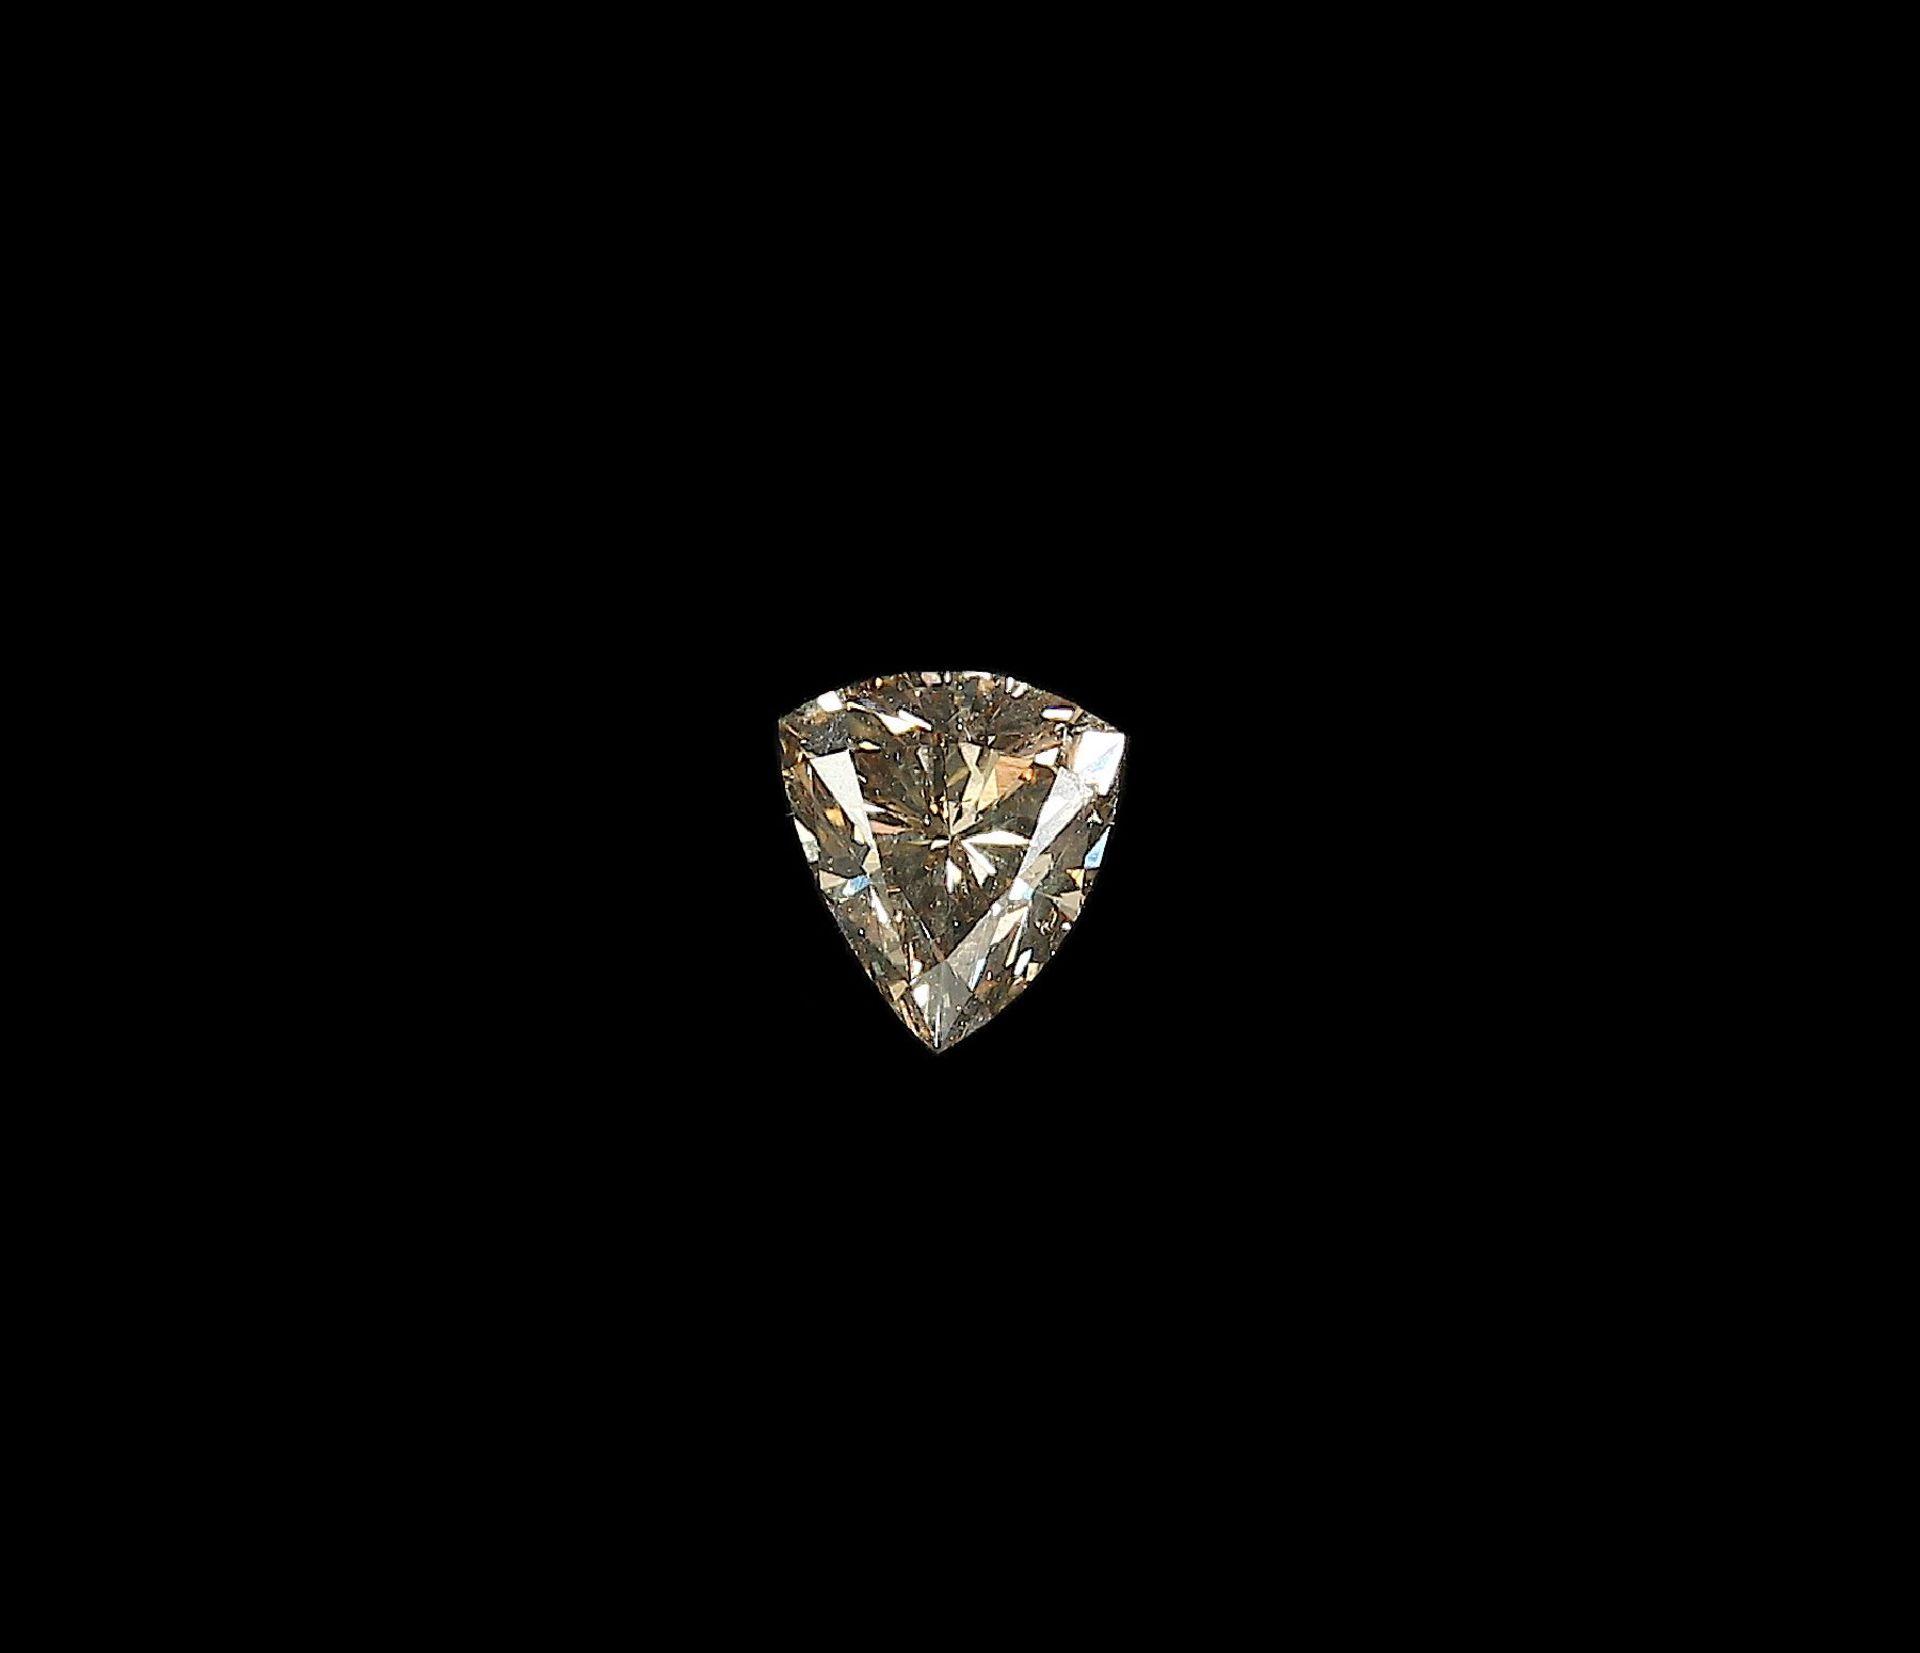 Los 70056 - Lose braune Diamant-Triangel 0.96 ctLoose brown diamond-triangle 0.96 ct